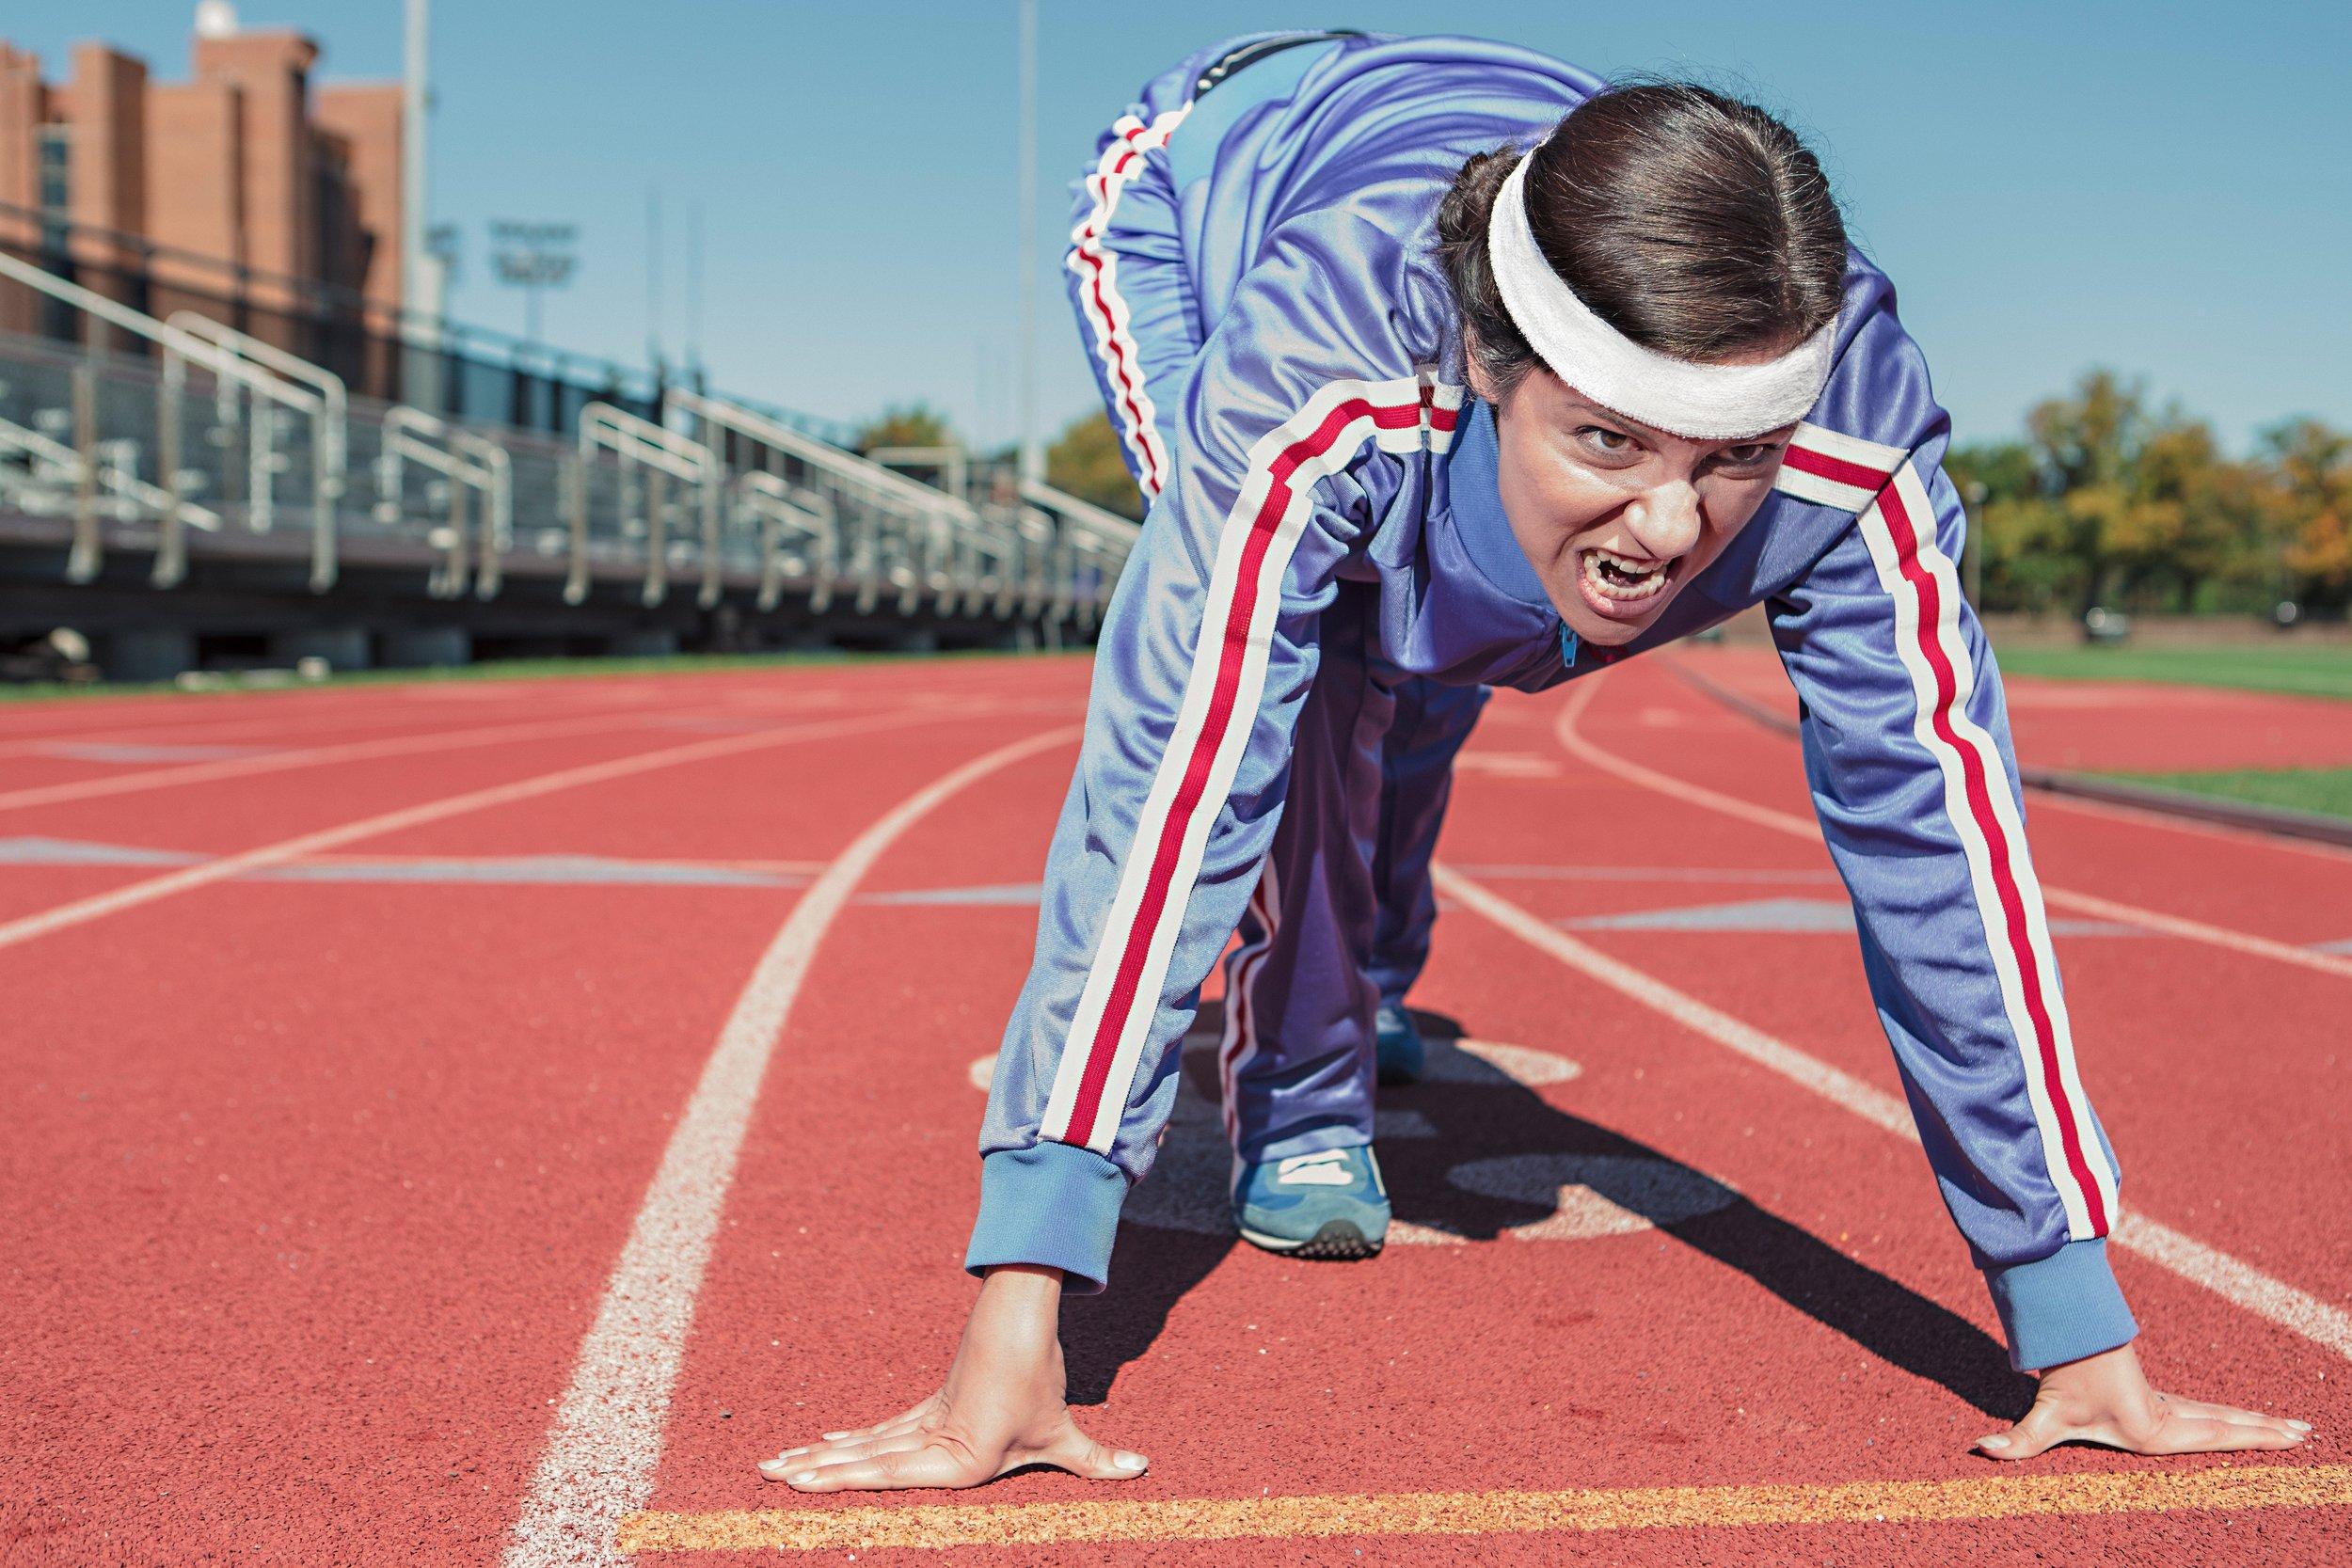 athlete-body-cinder-track-4078.jpg